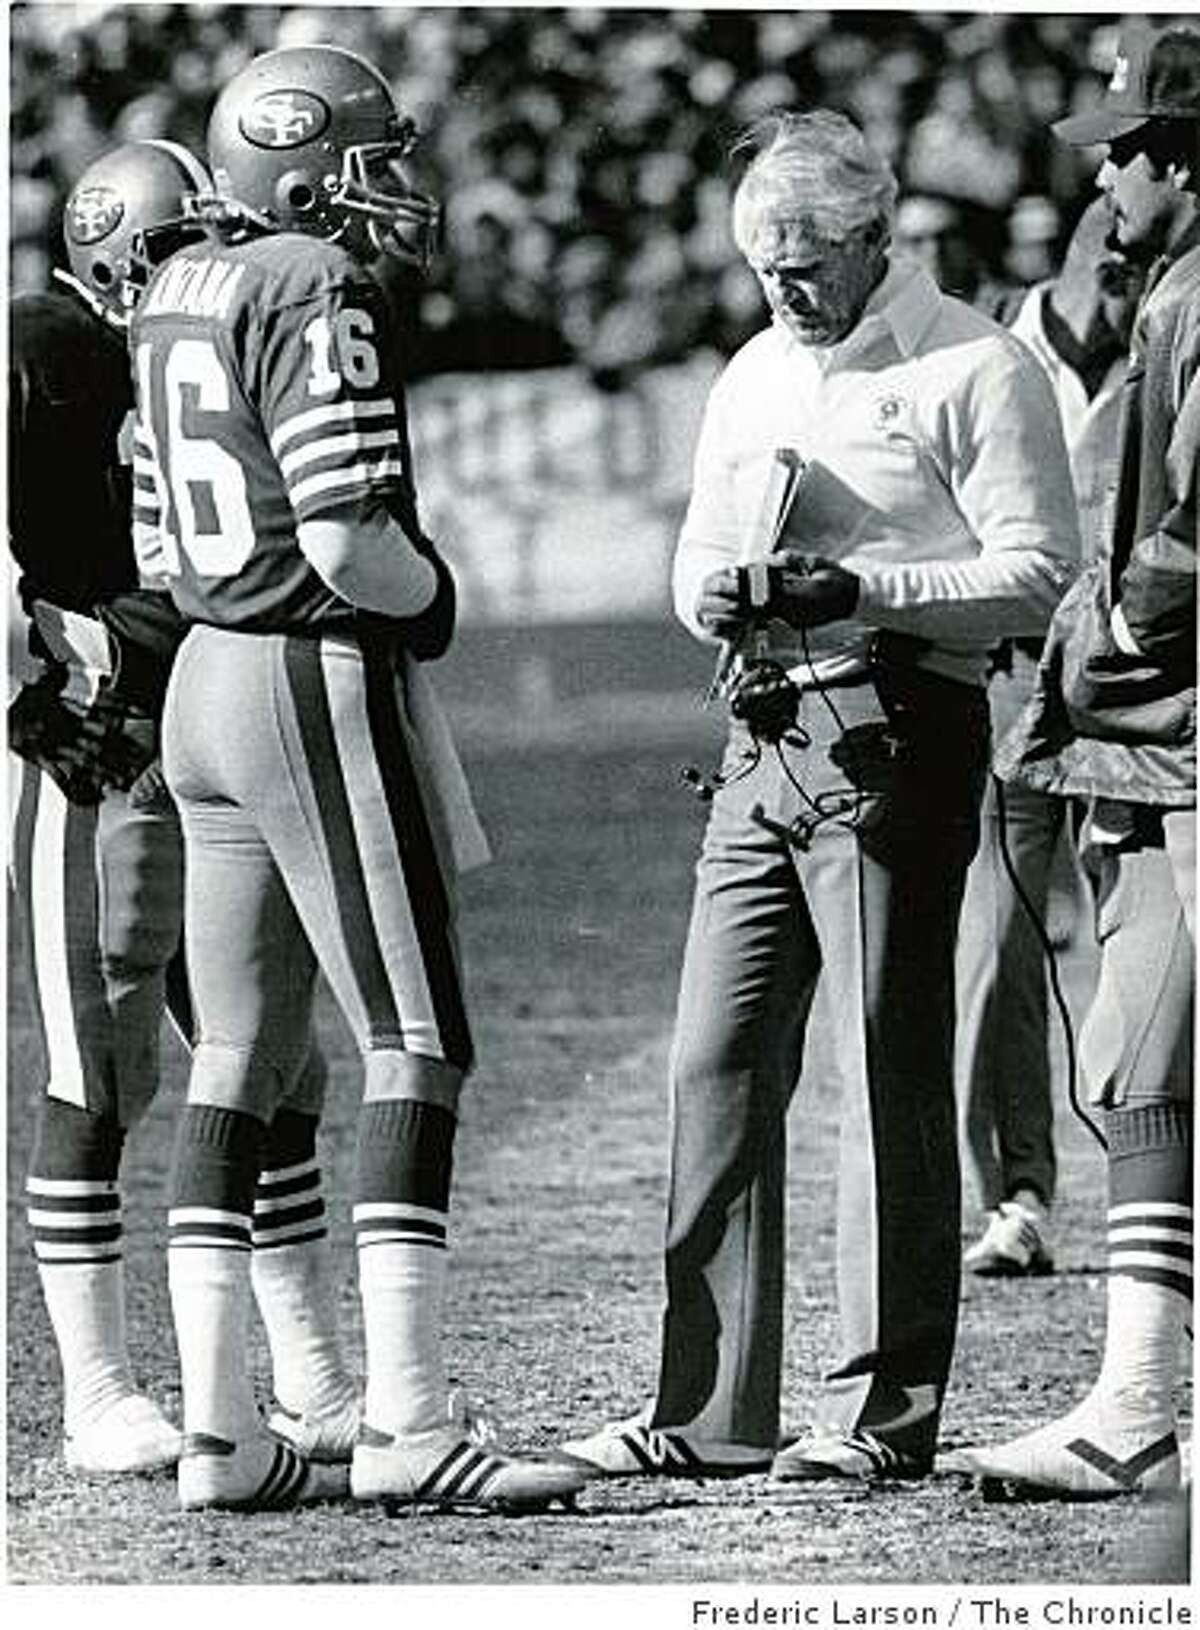 Coach Bill Walsh and quarterback Joe Montana guided the 49ers of 1984 to a 15-1 regular-season mark and a record 18 wins through Super Bowl XIX. Ran on: 12-28-2007